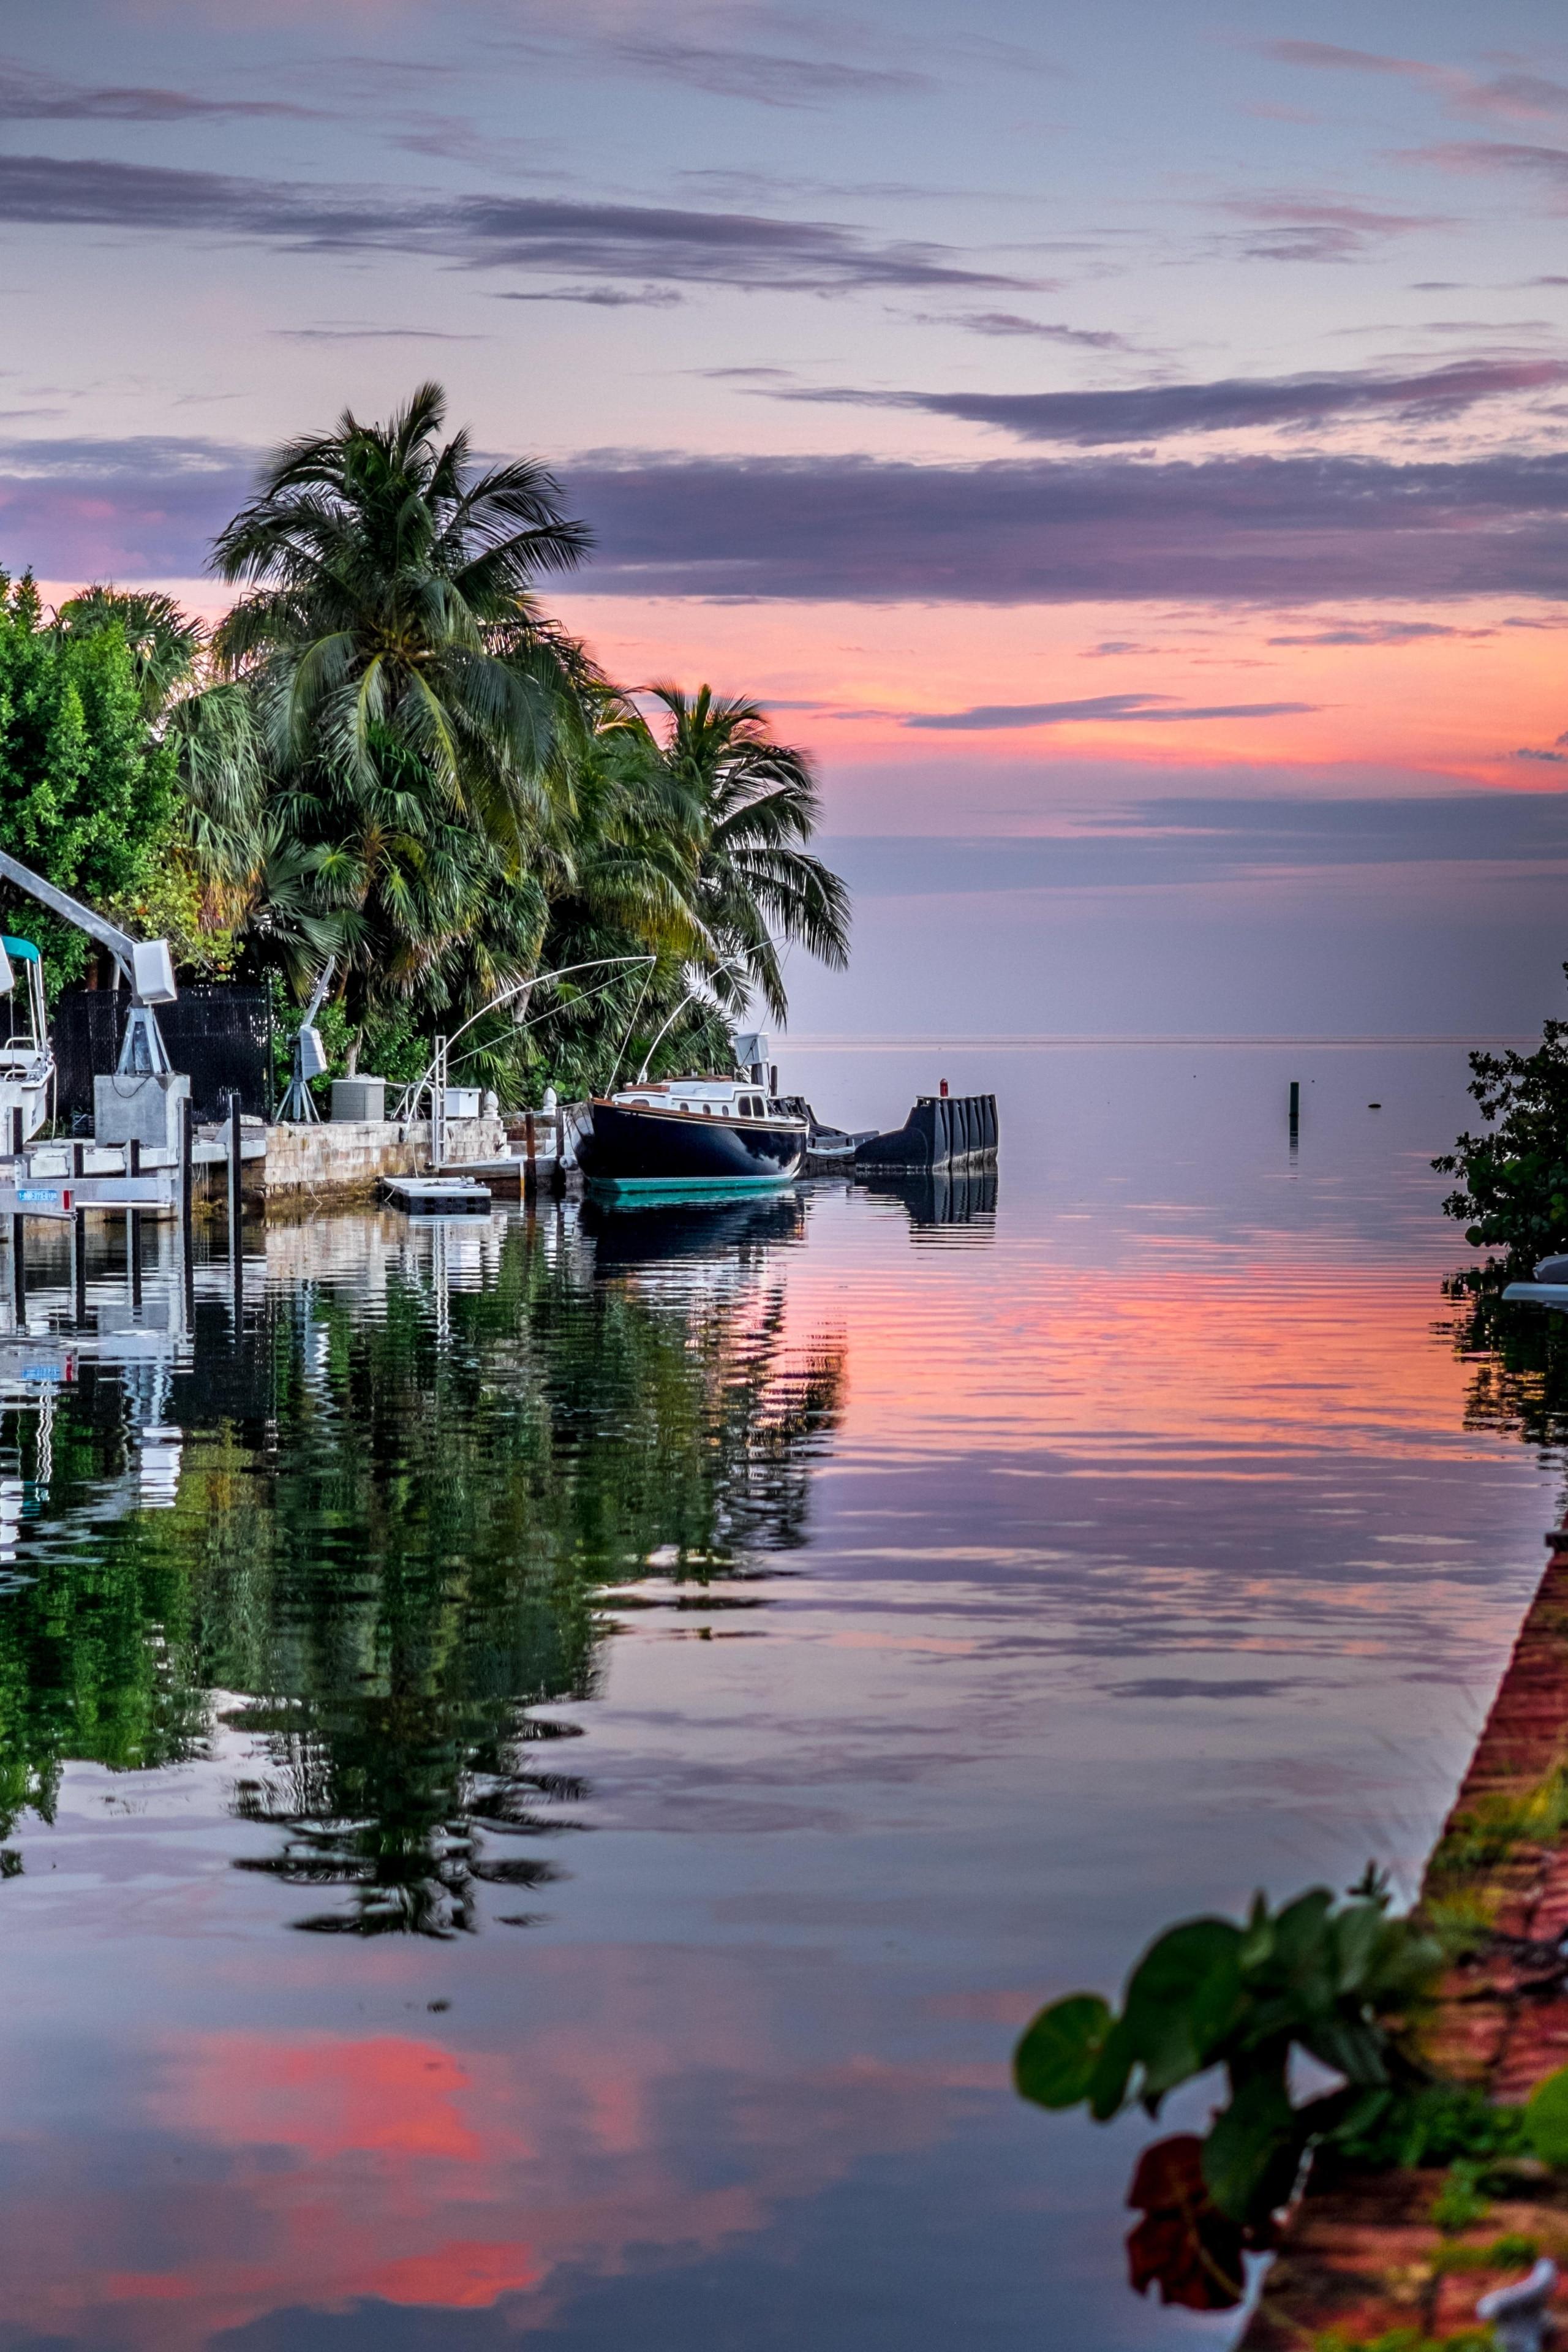 Cudjoe Key, Florida, United States of America